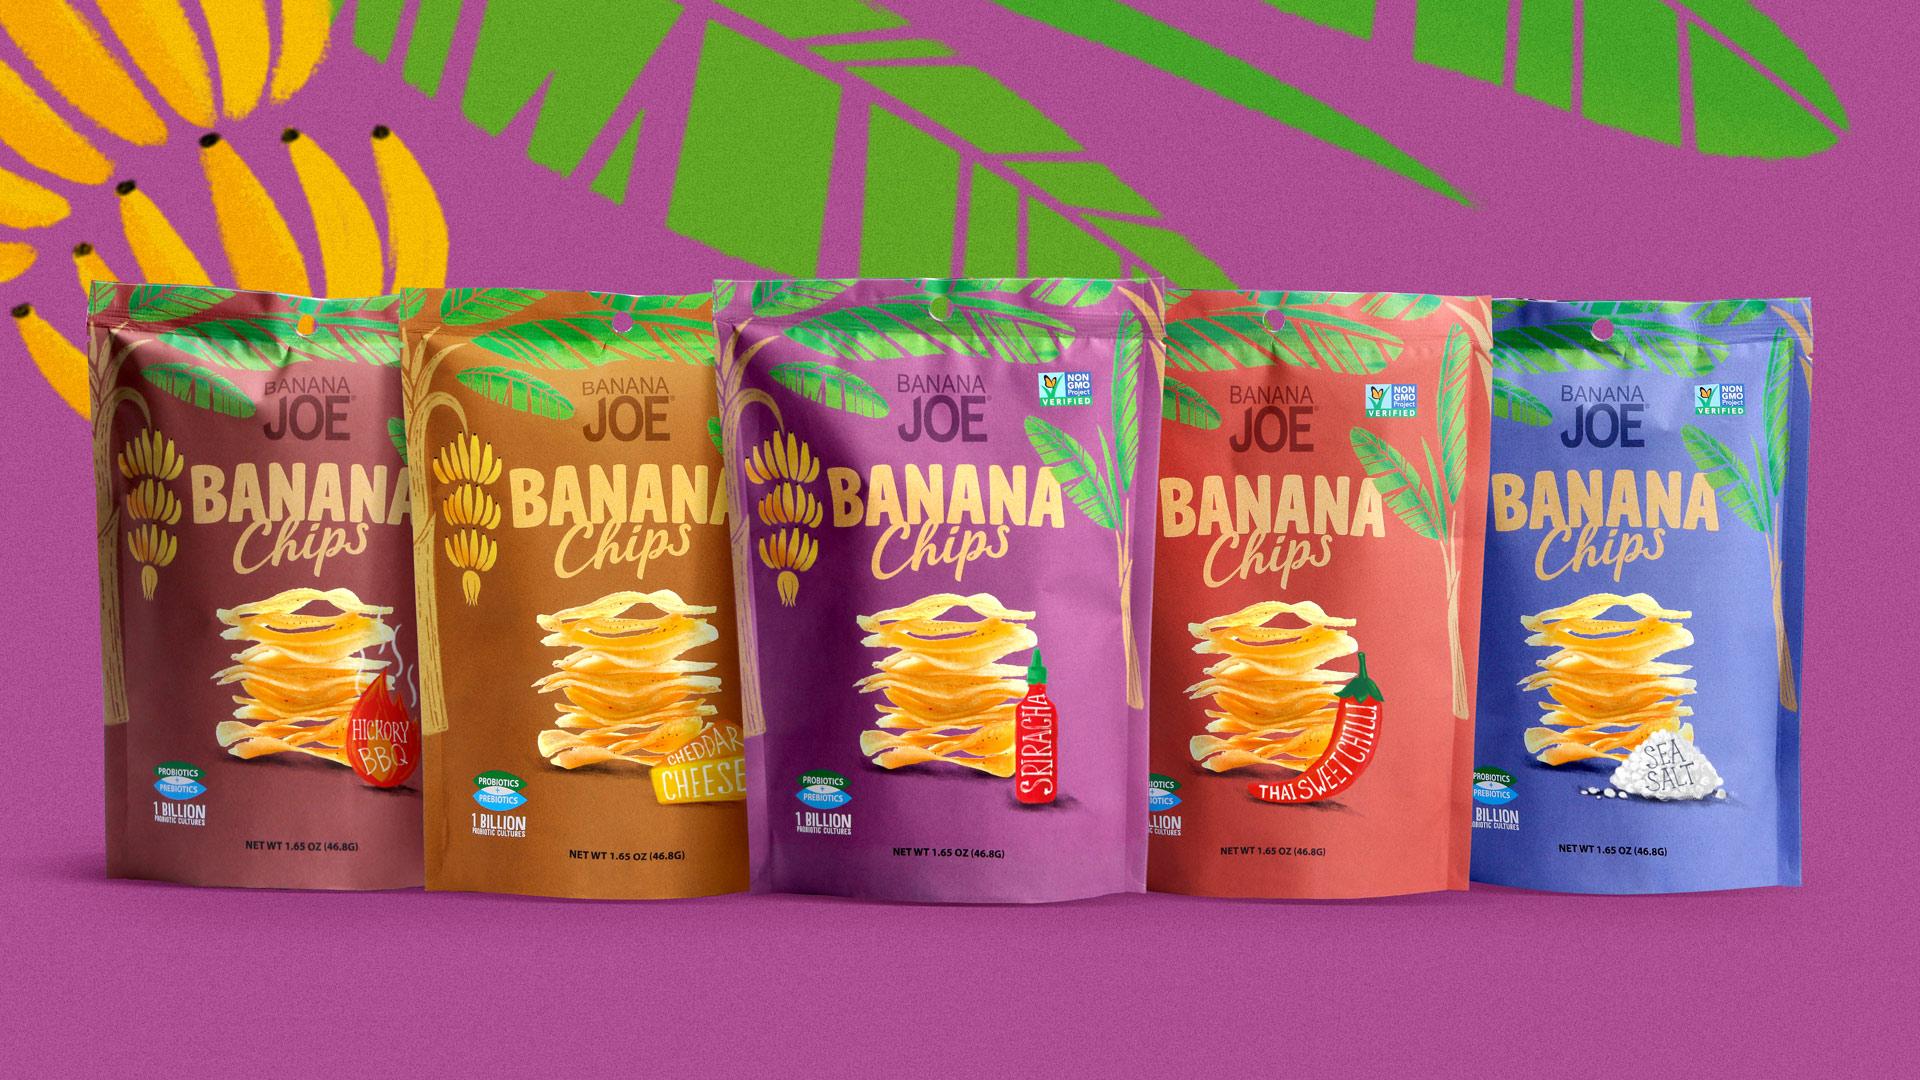 PROFSOYUZ Created New Packaging Design for Banana Chips